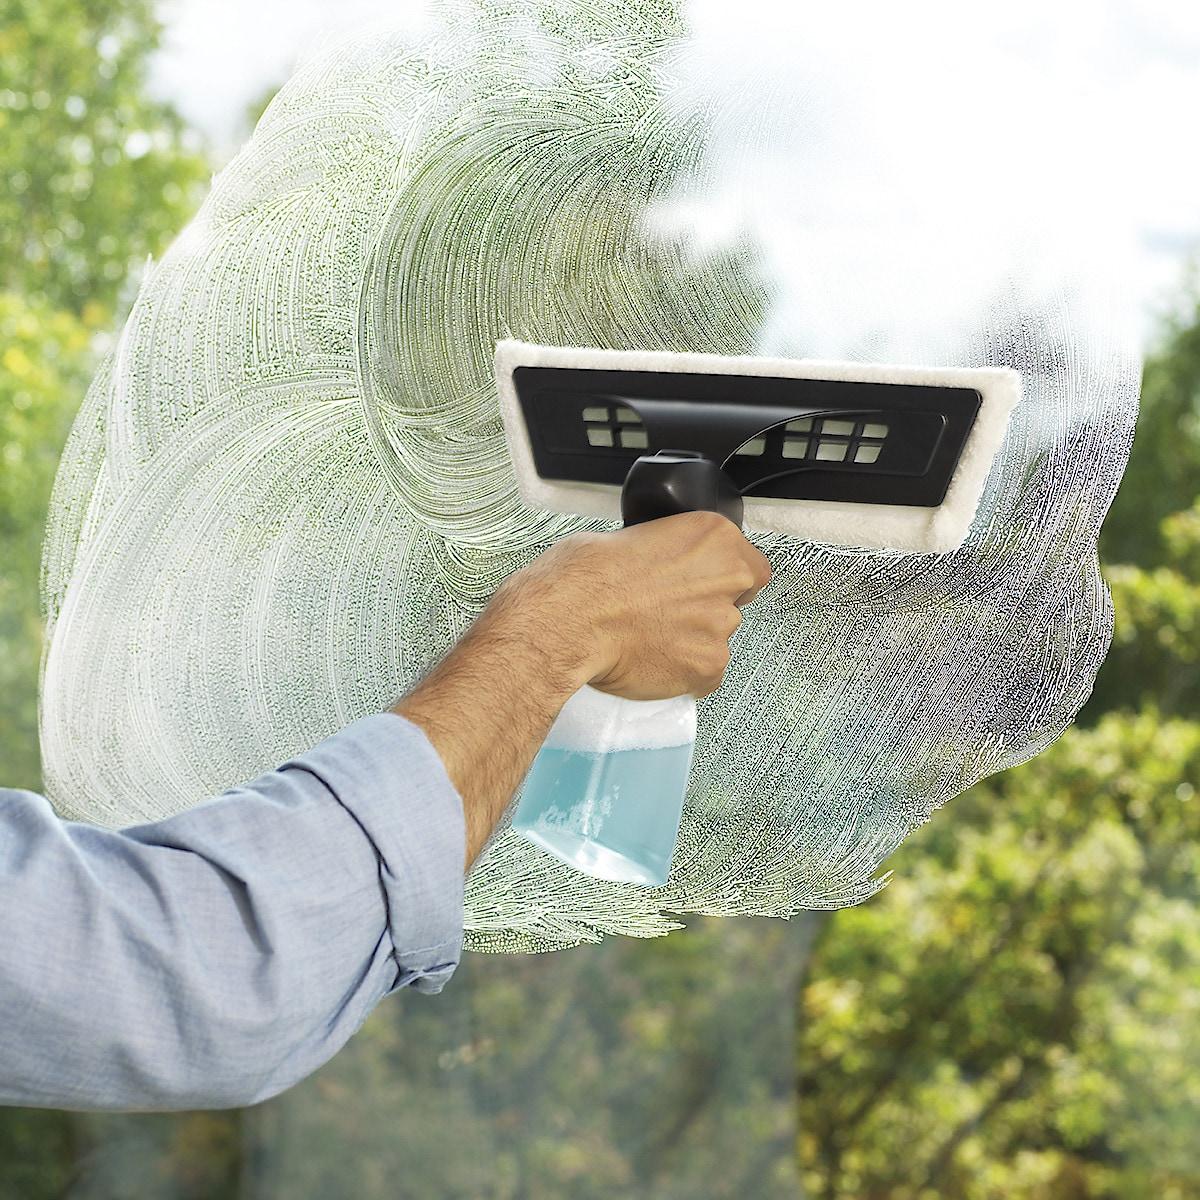 Electrolux WELL S7, WS71-6AS vindusvasker